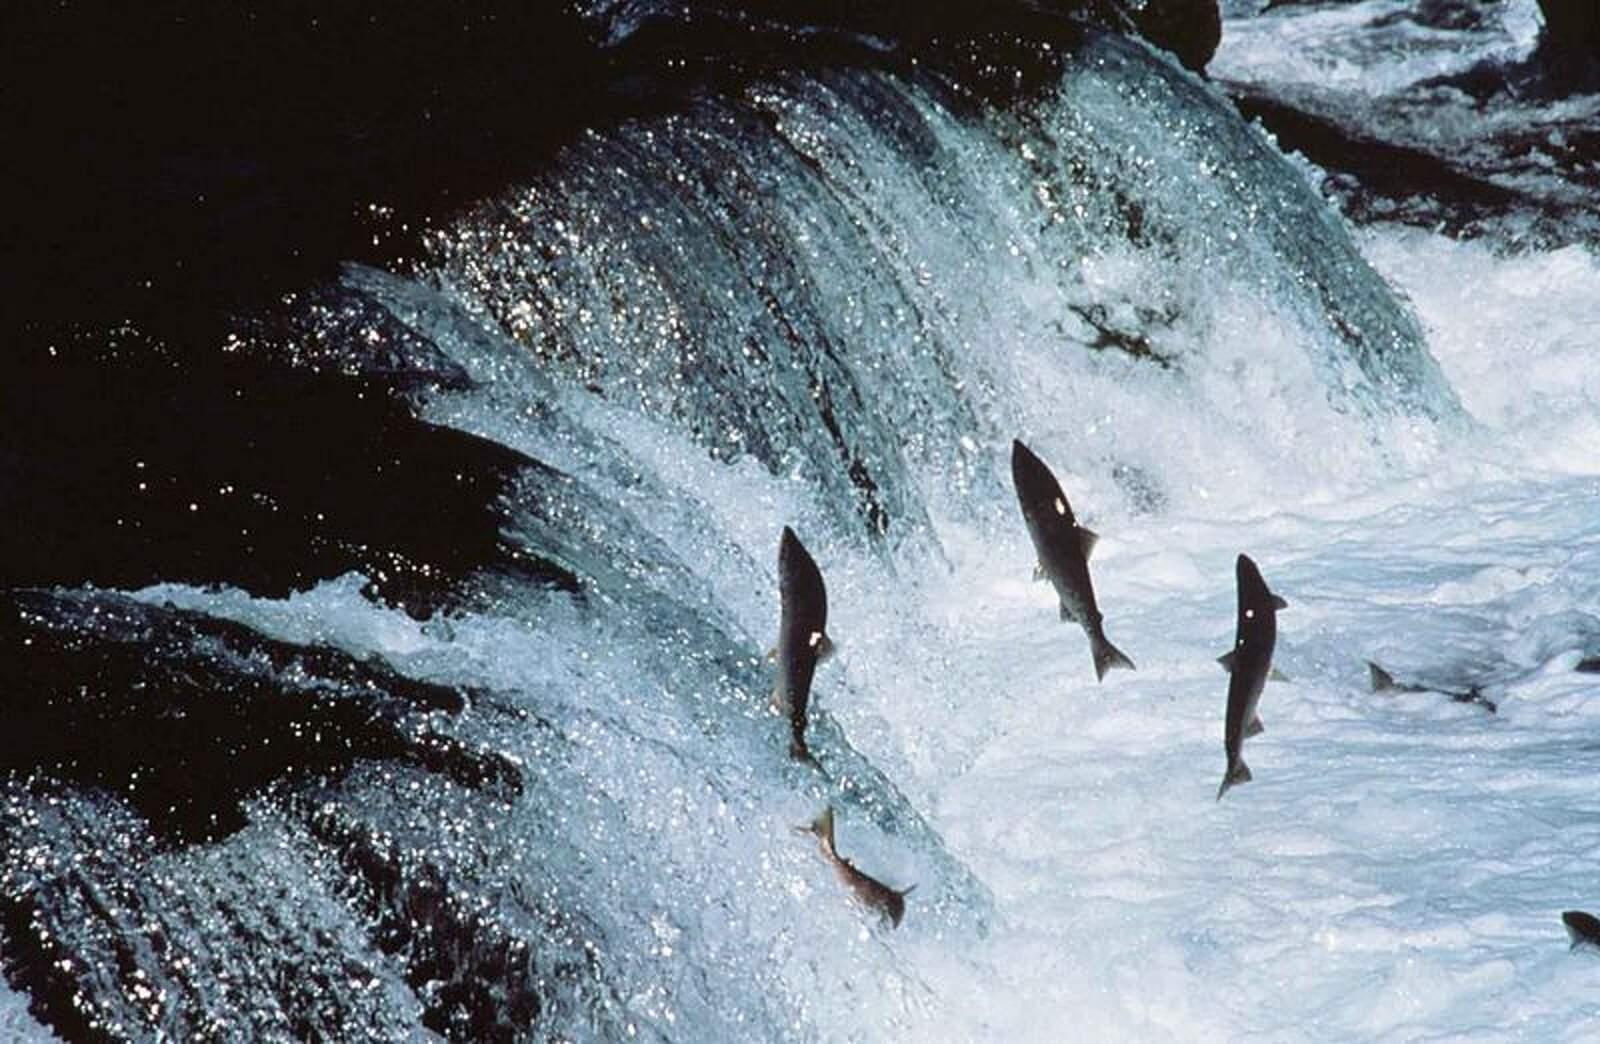 Els salmons són l'hoste d'aquest animal, un paràsit anaerobi